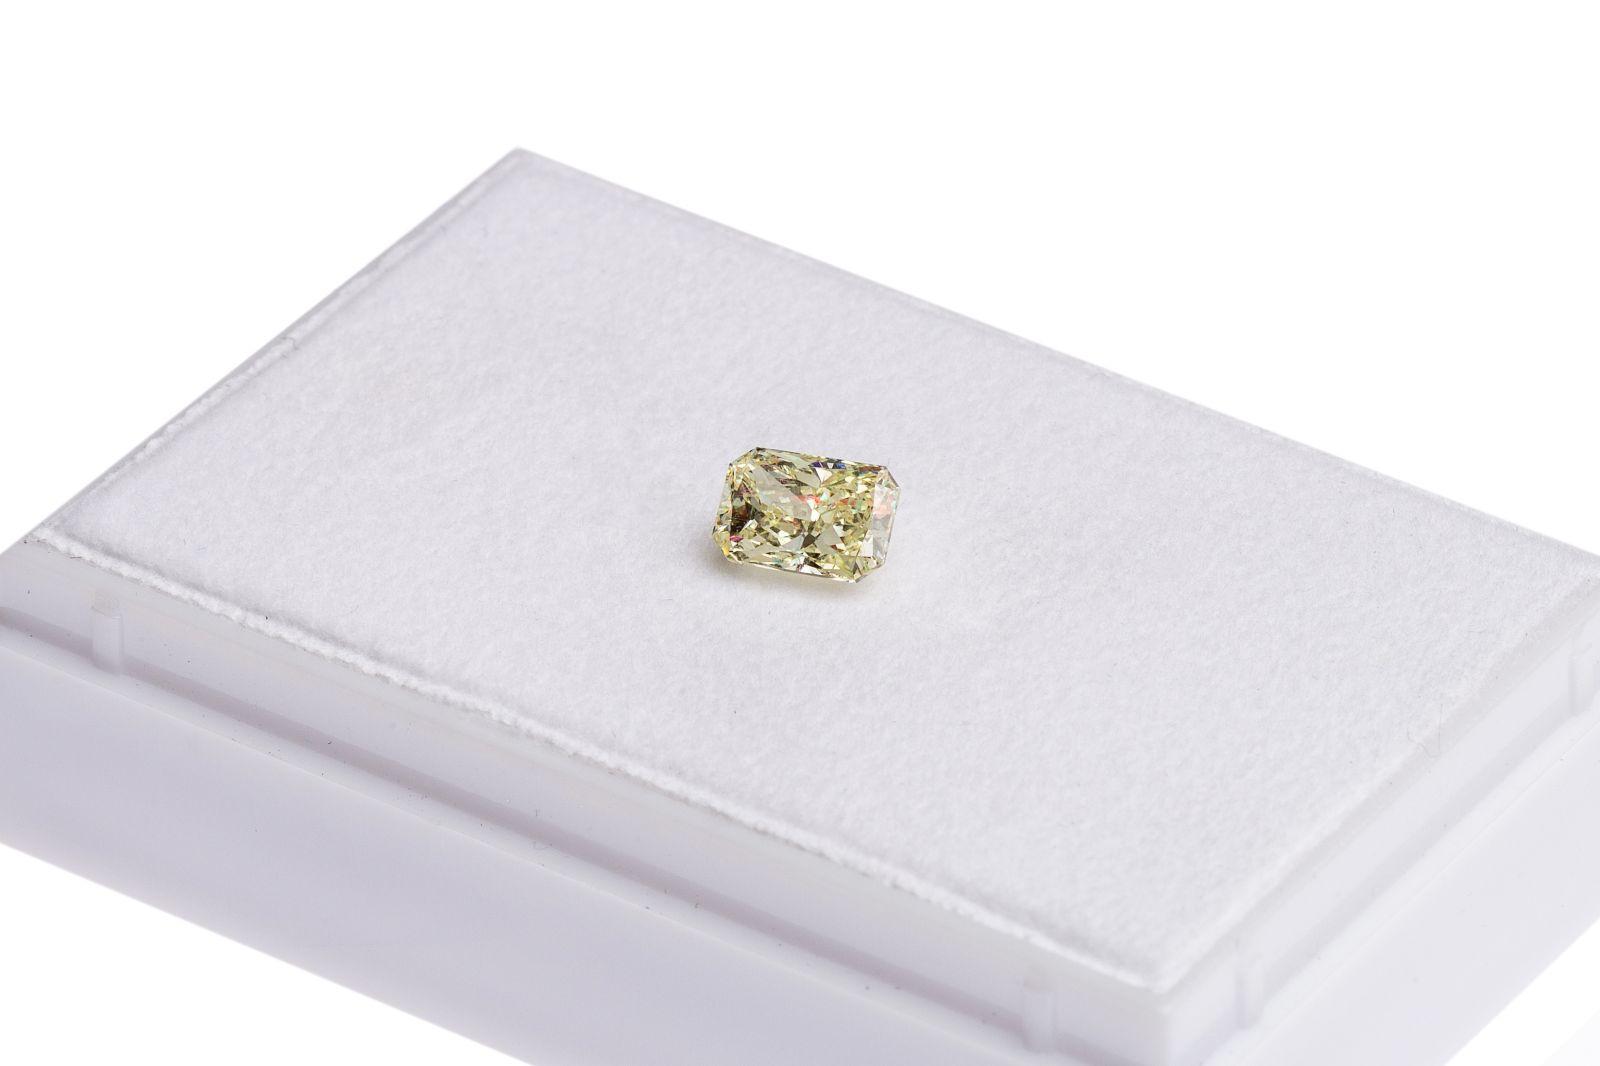 #186 diamond | Loser Diamant Image